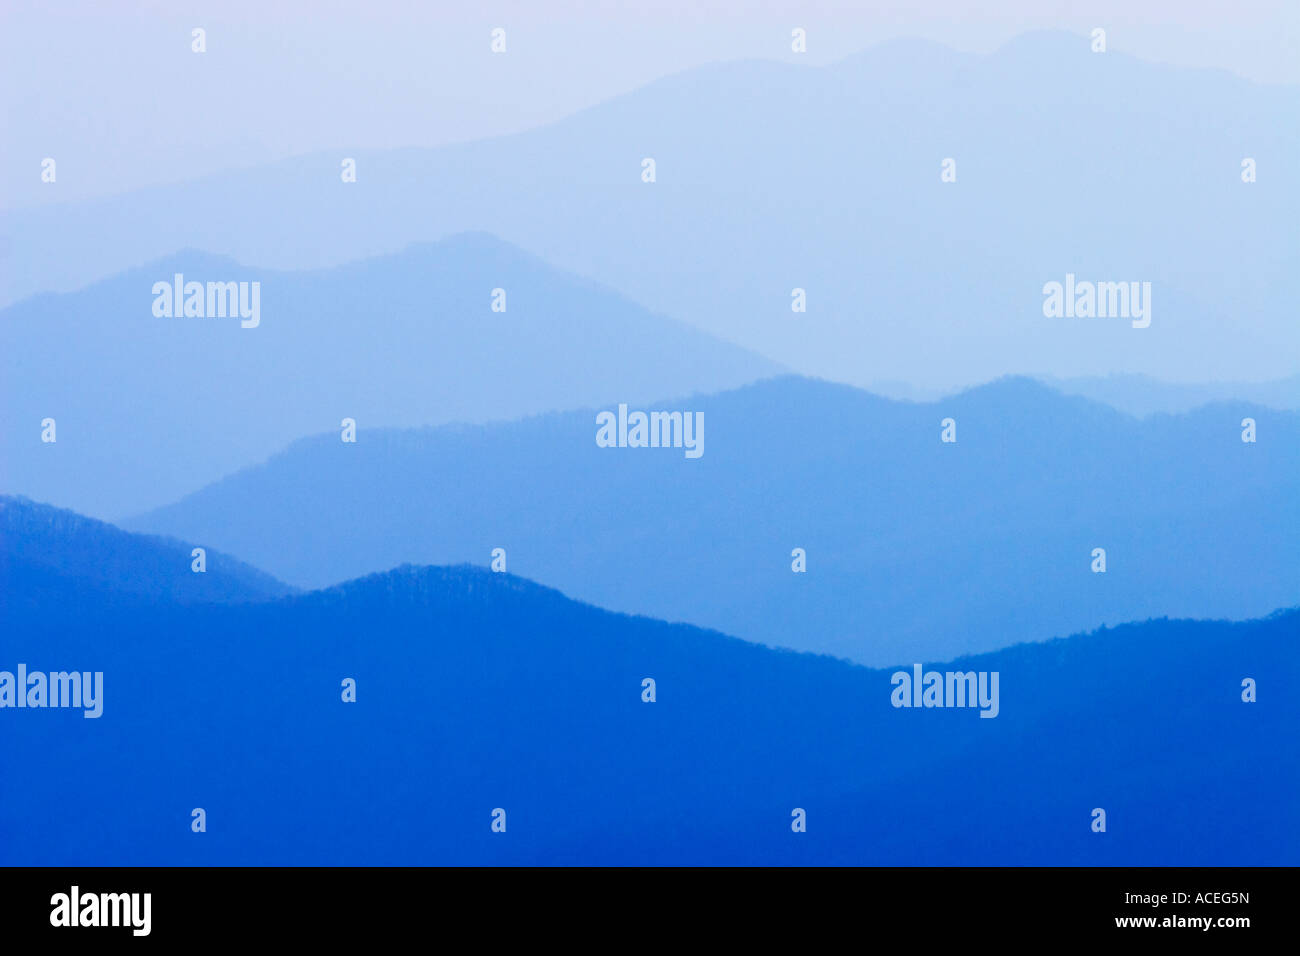 Hazy mountains prior to sunrise - Stock Image